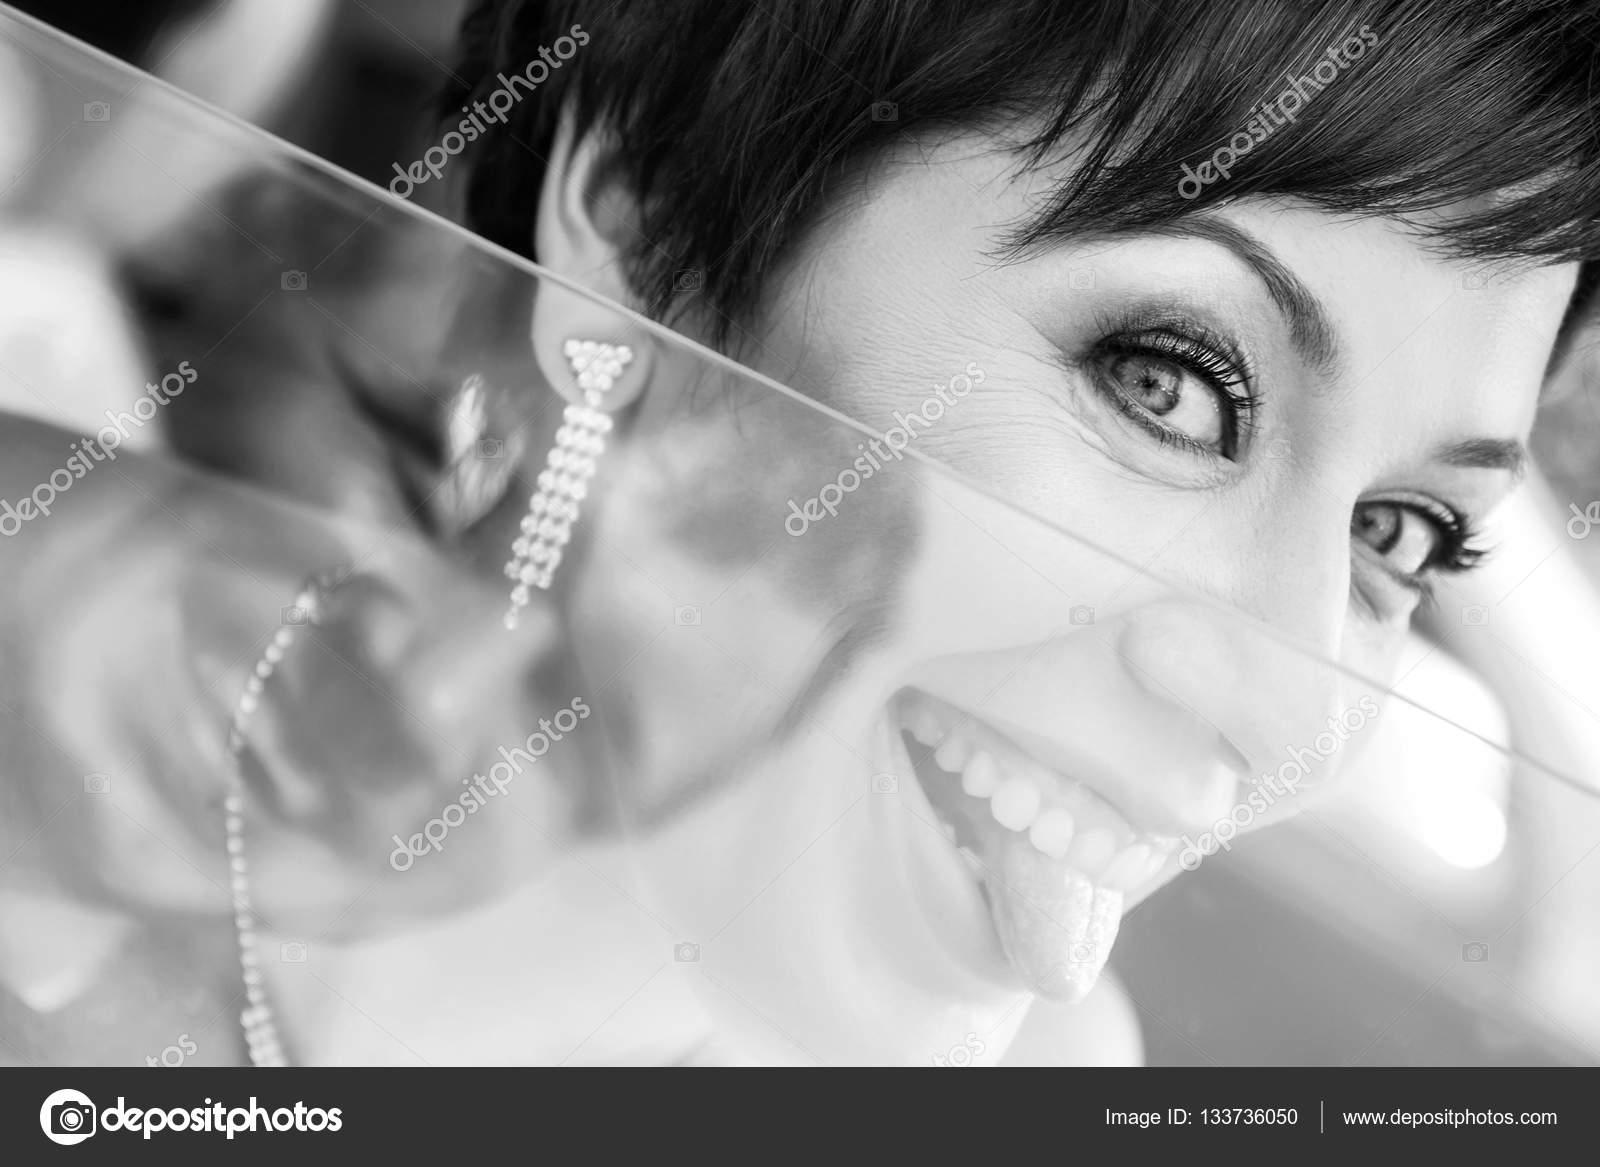 bröllop 35 år Rolig brud i bil leende brudgummen. Kvinna 35 år. Bröllop  bröllop 35 år